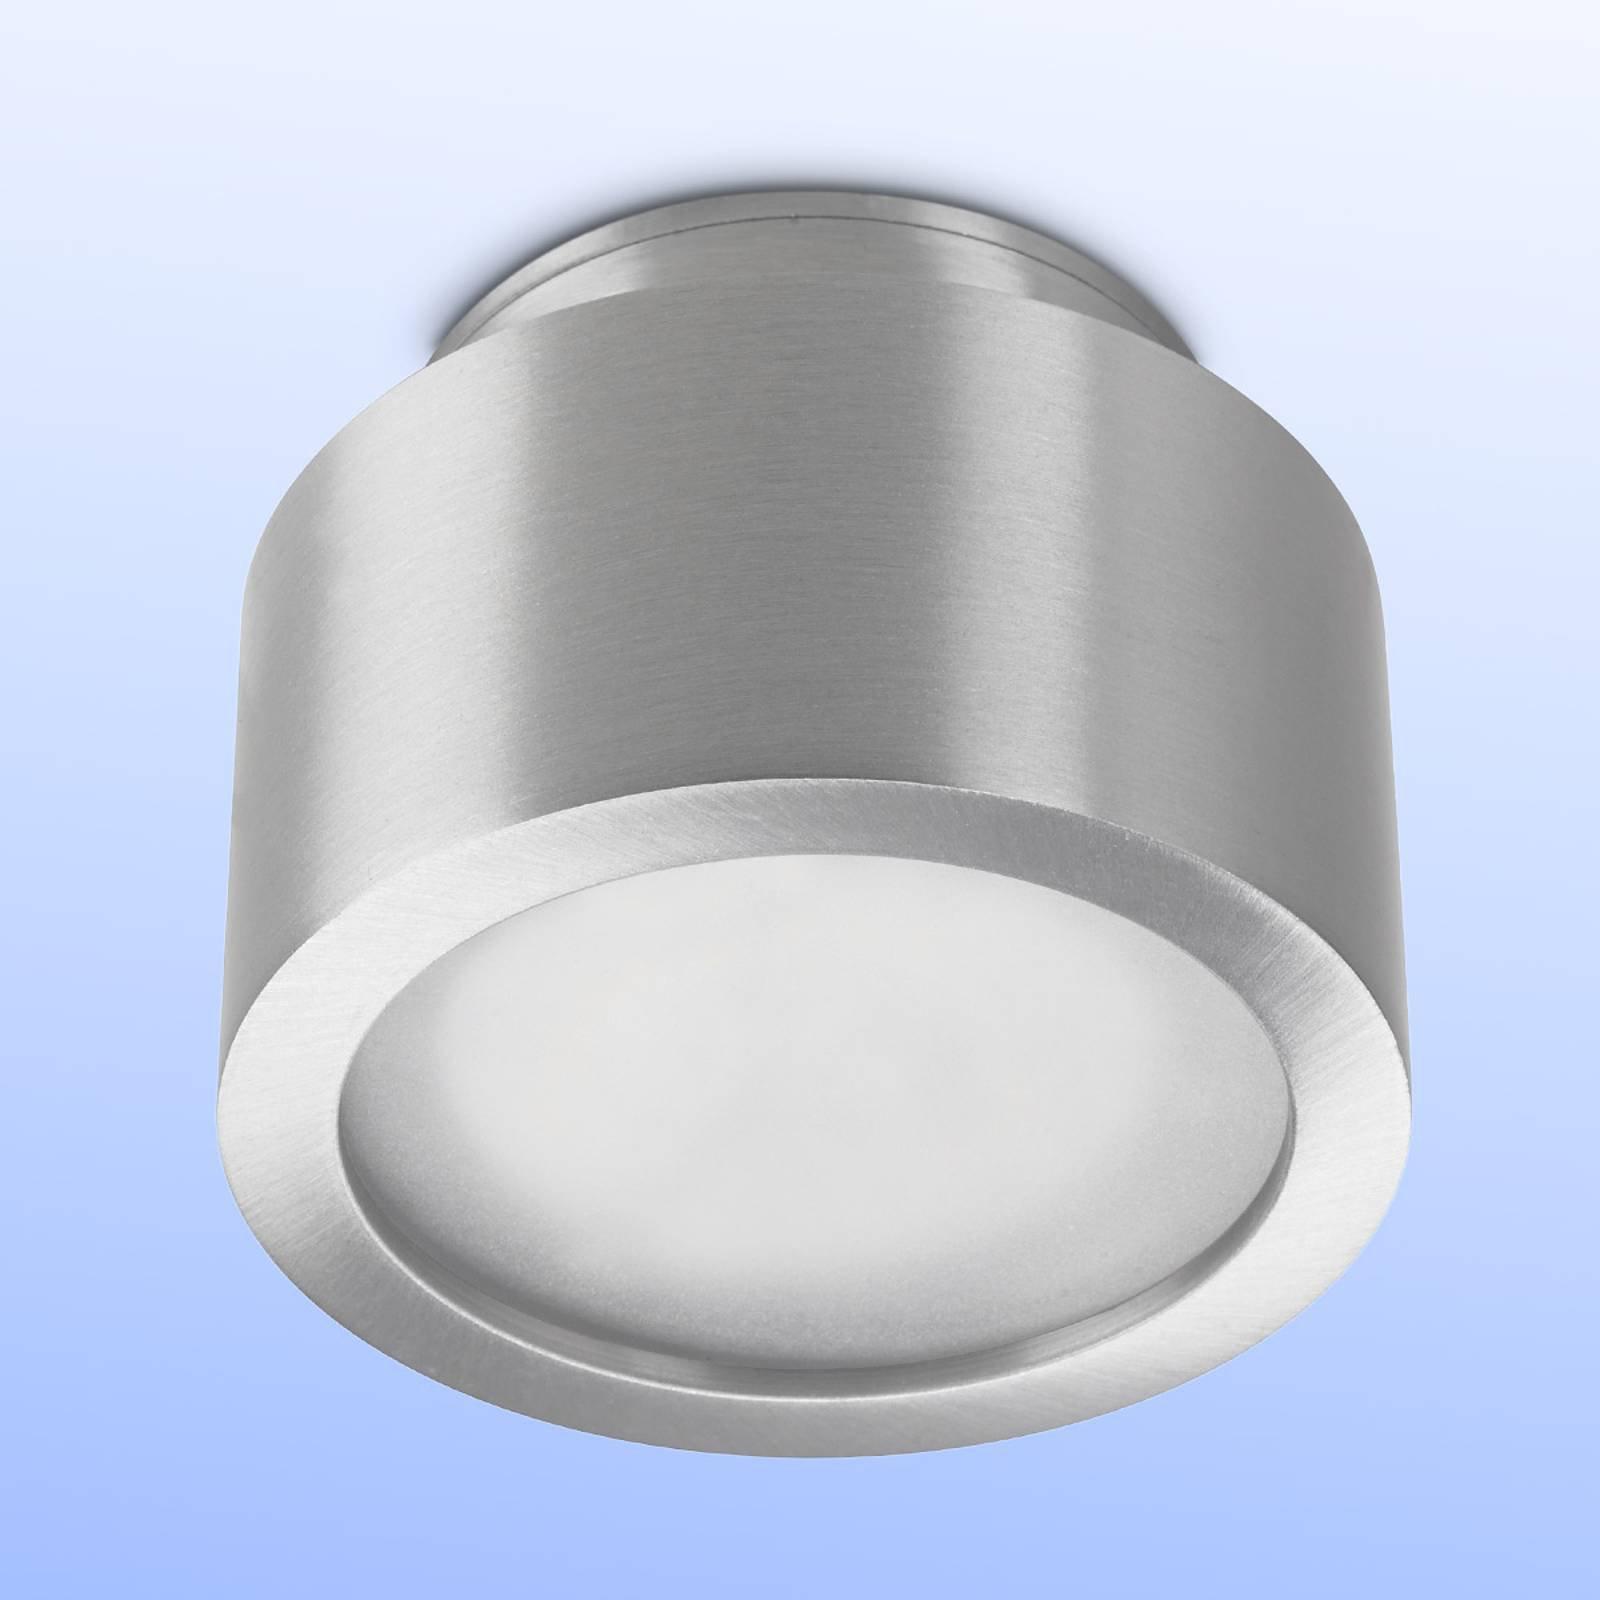 Miniplafon - taklampe til bad med LED